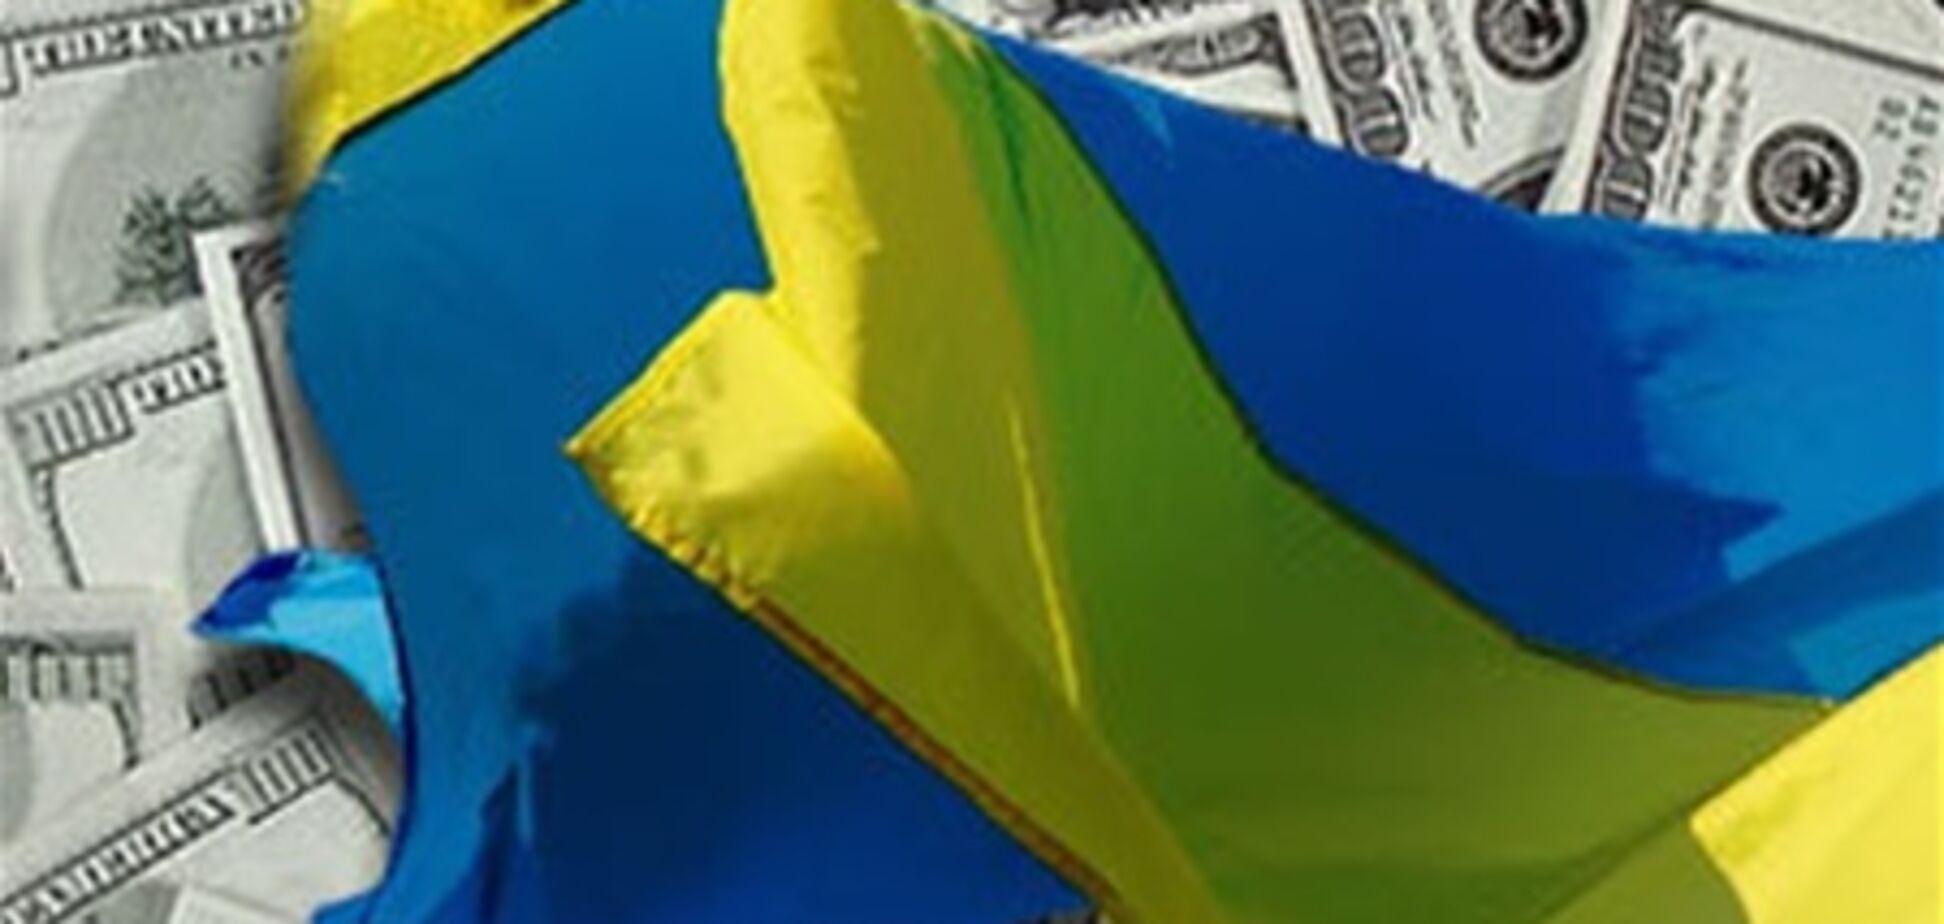 Державний борг України становить 360,5 млрд гривень